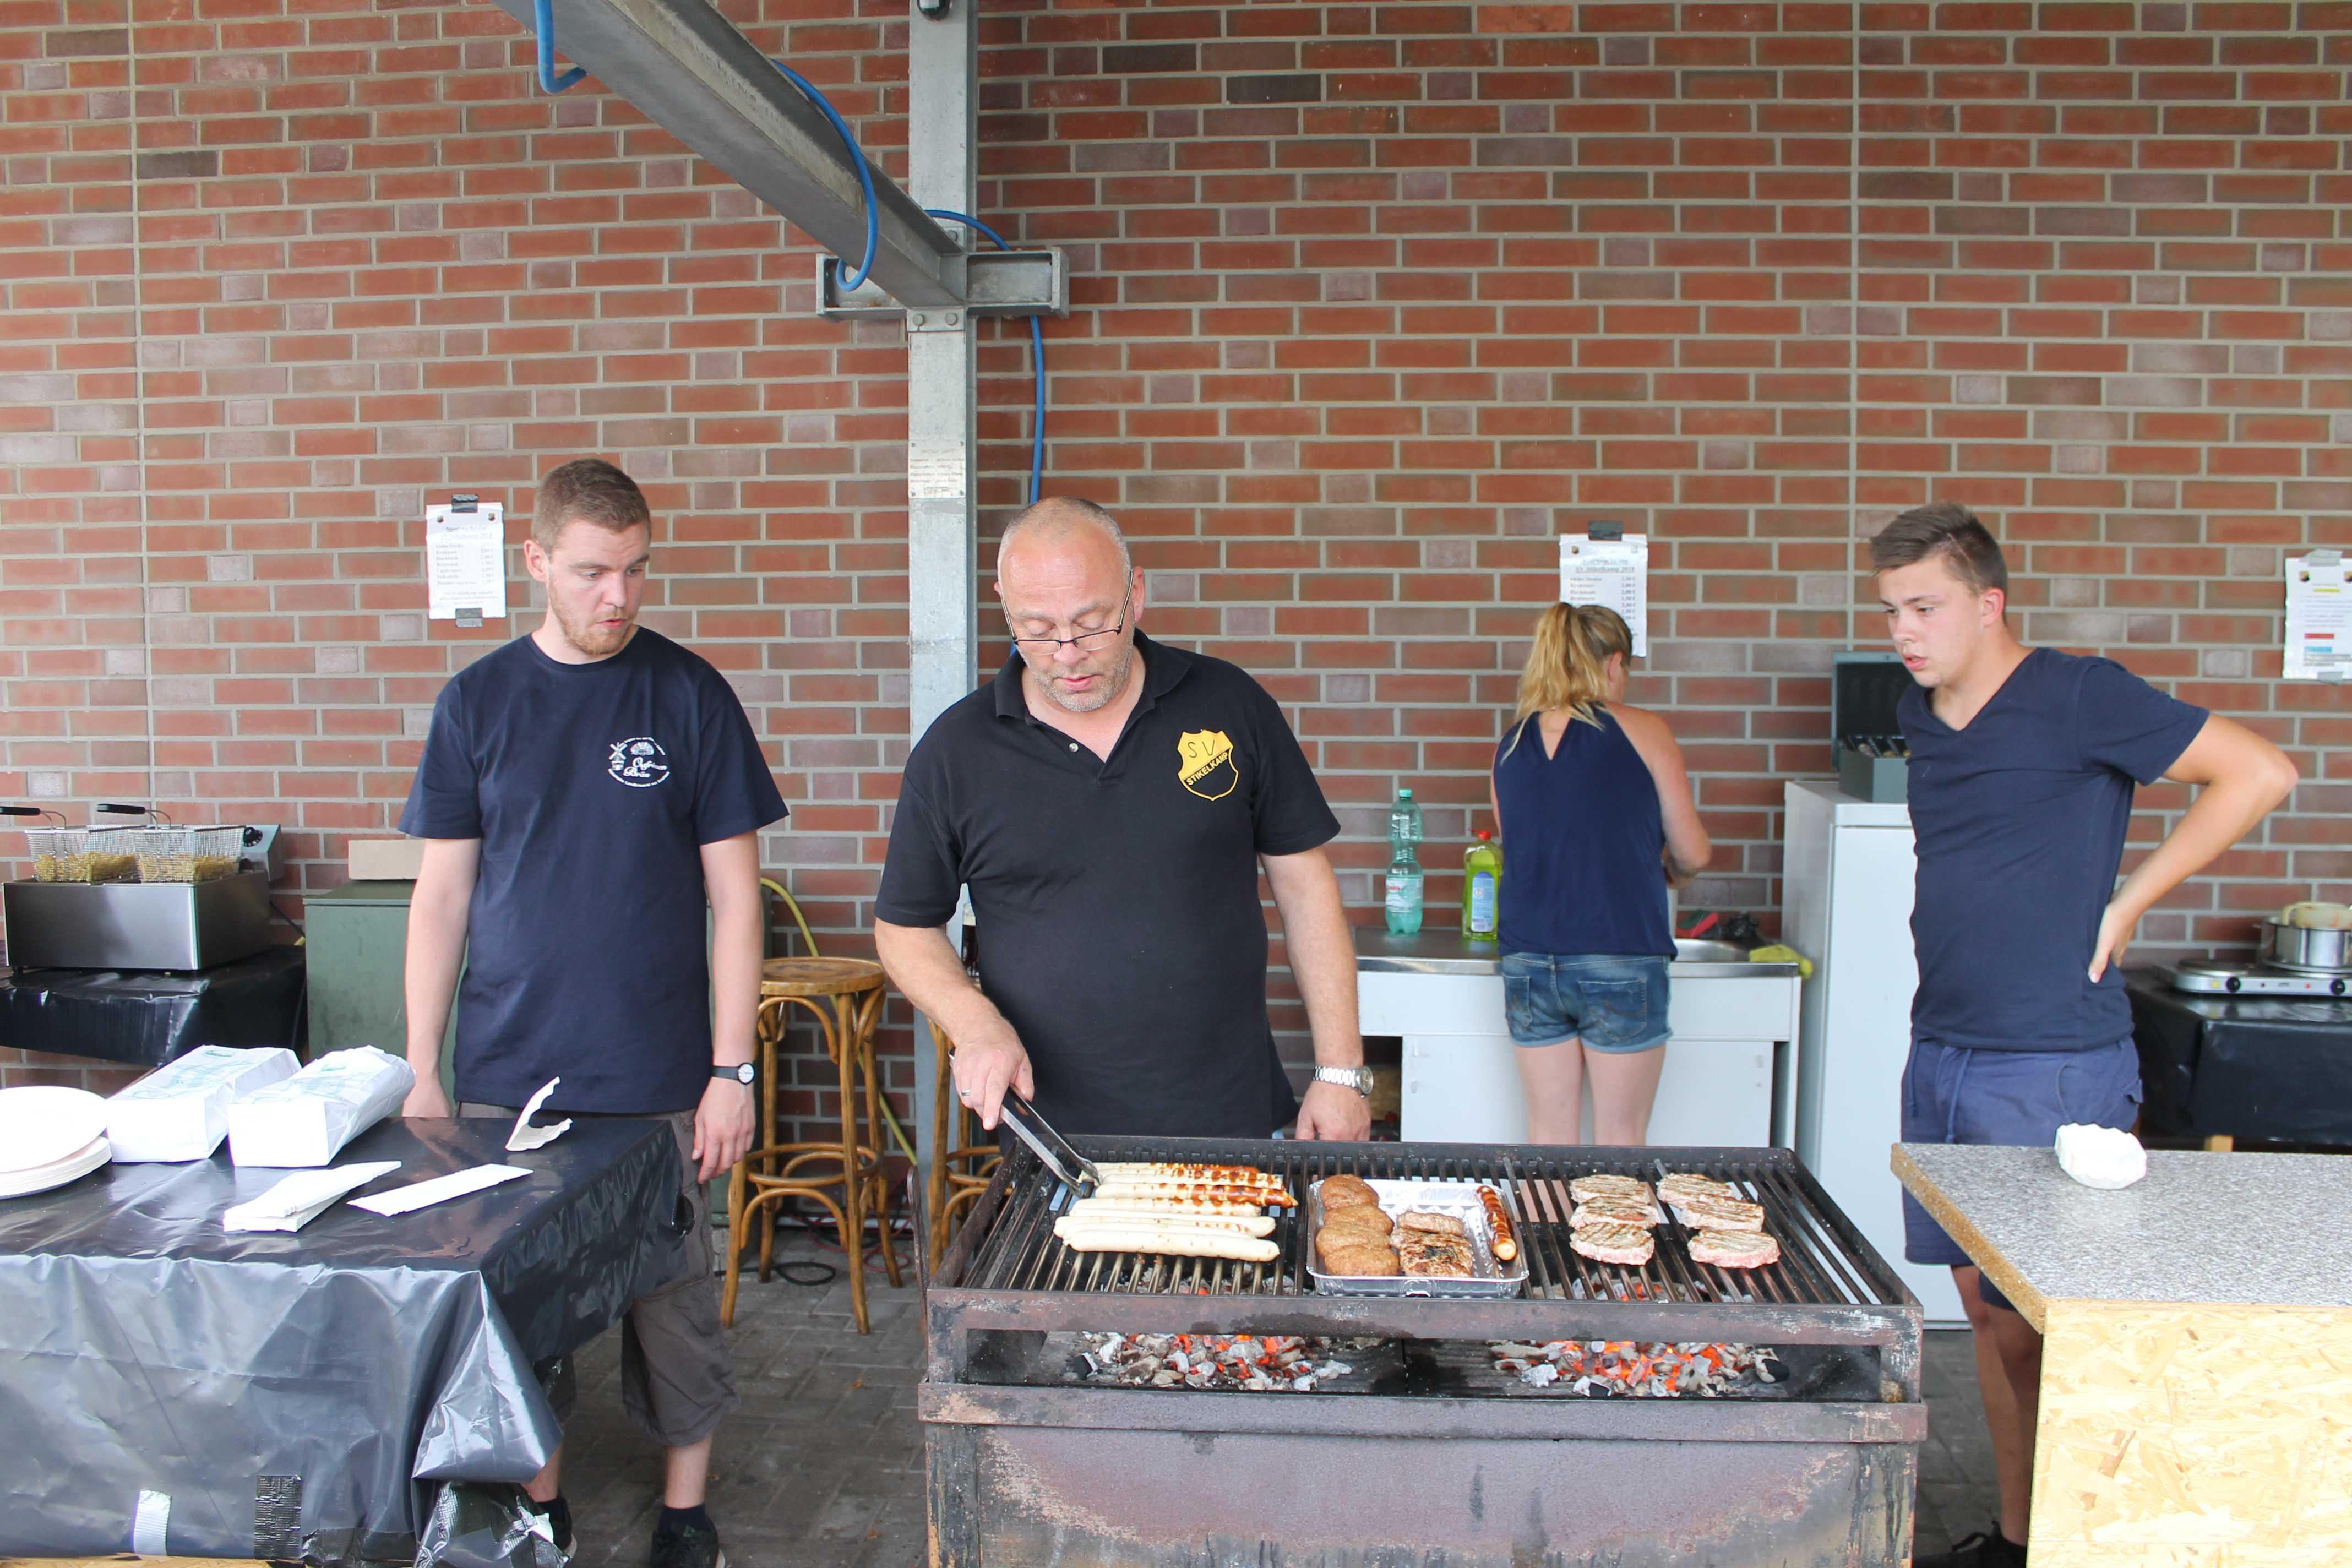 2018-08-01 Sportwoche - 1. Herrenturnier (1)